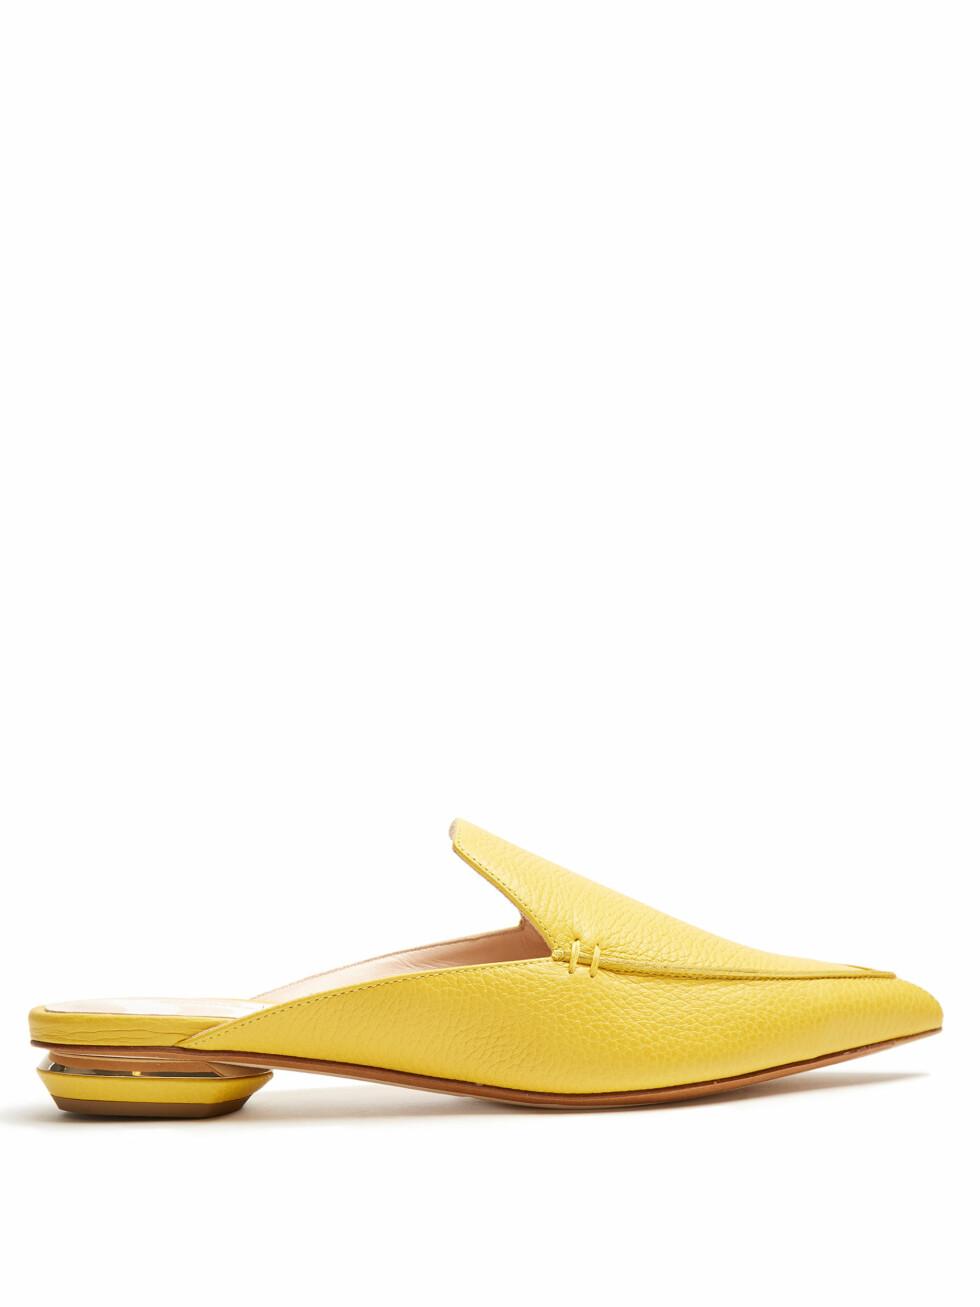 Loafers fra Nicholas Kirkwood via Matchesfashion.com | kr 2730 | http://www.matchesfashion.com/intl/products/Nicholas-Kirkwood-Beya-grained-leather-backless-loafers-1079412